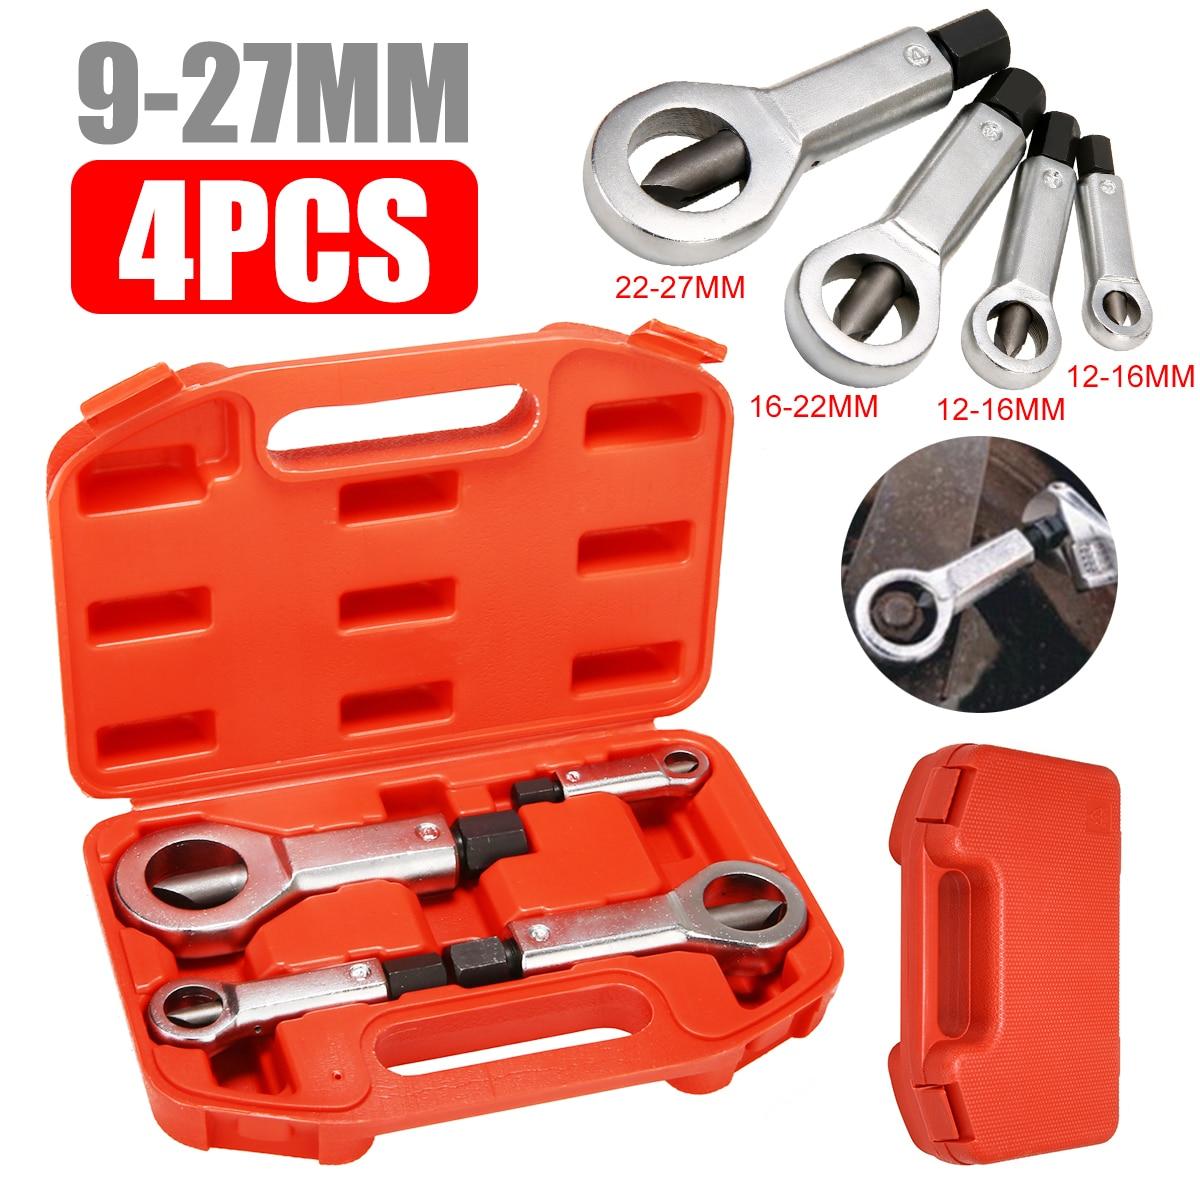 4pcs 9 27mm Sliding Tooth Nut Remover Manual Pressure Tools Break Manually Metal Nut Break Nut